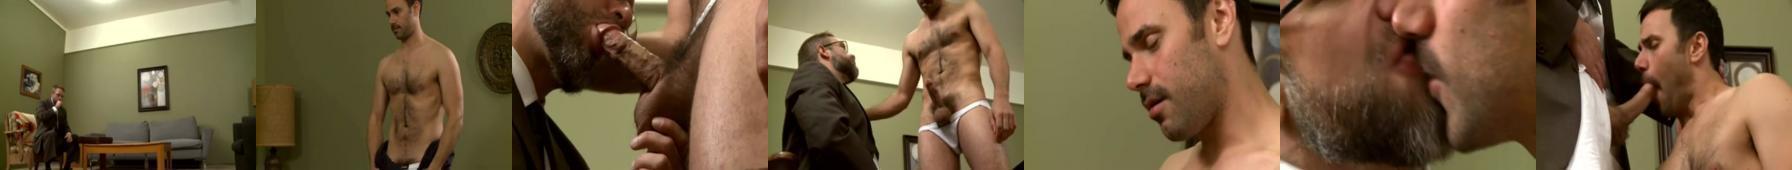 żonaty facet zalany spermą młodego chłopaka